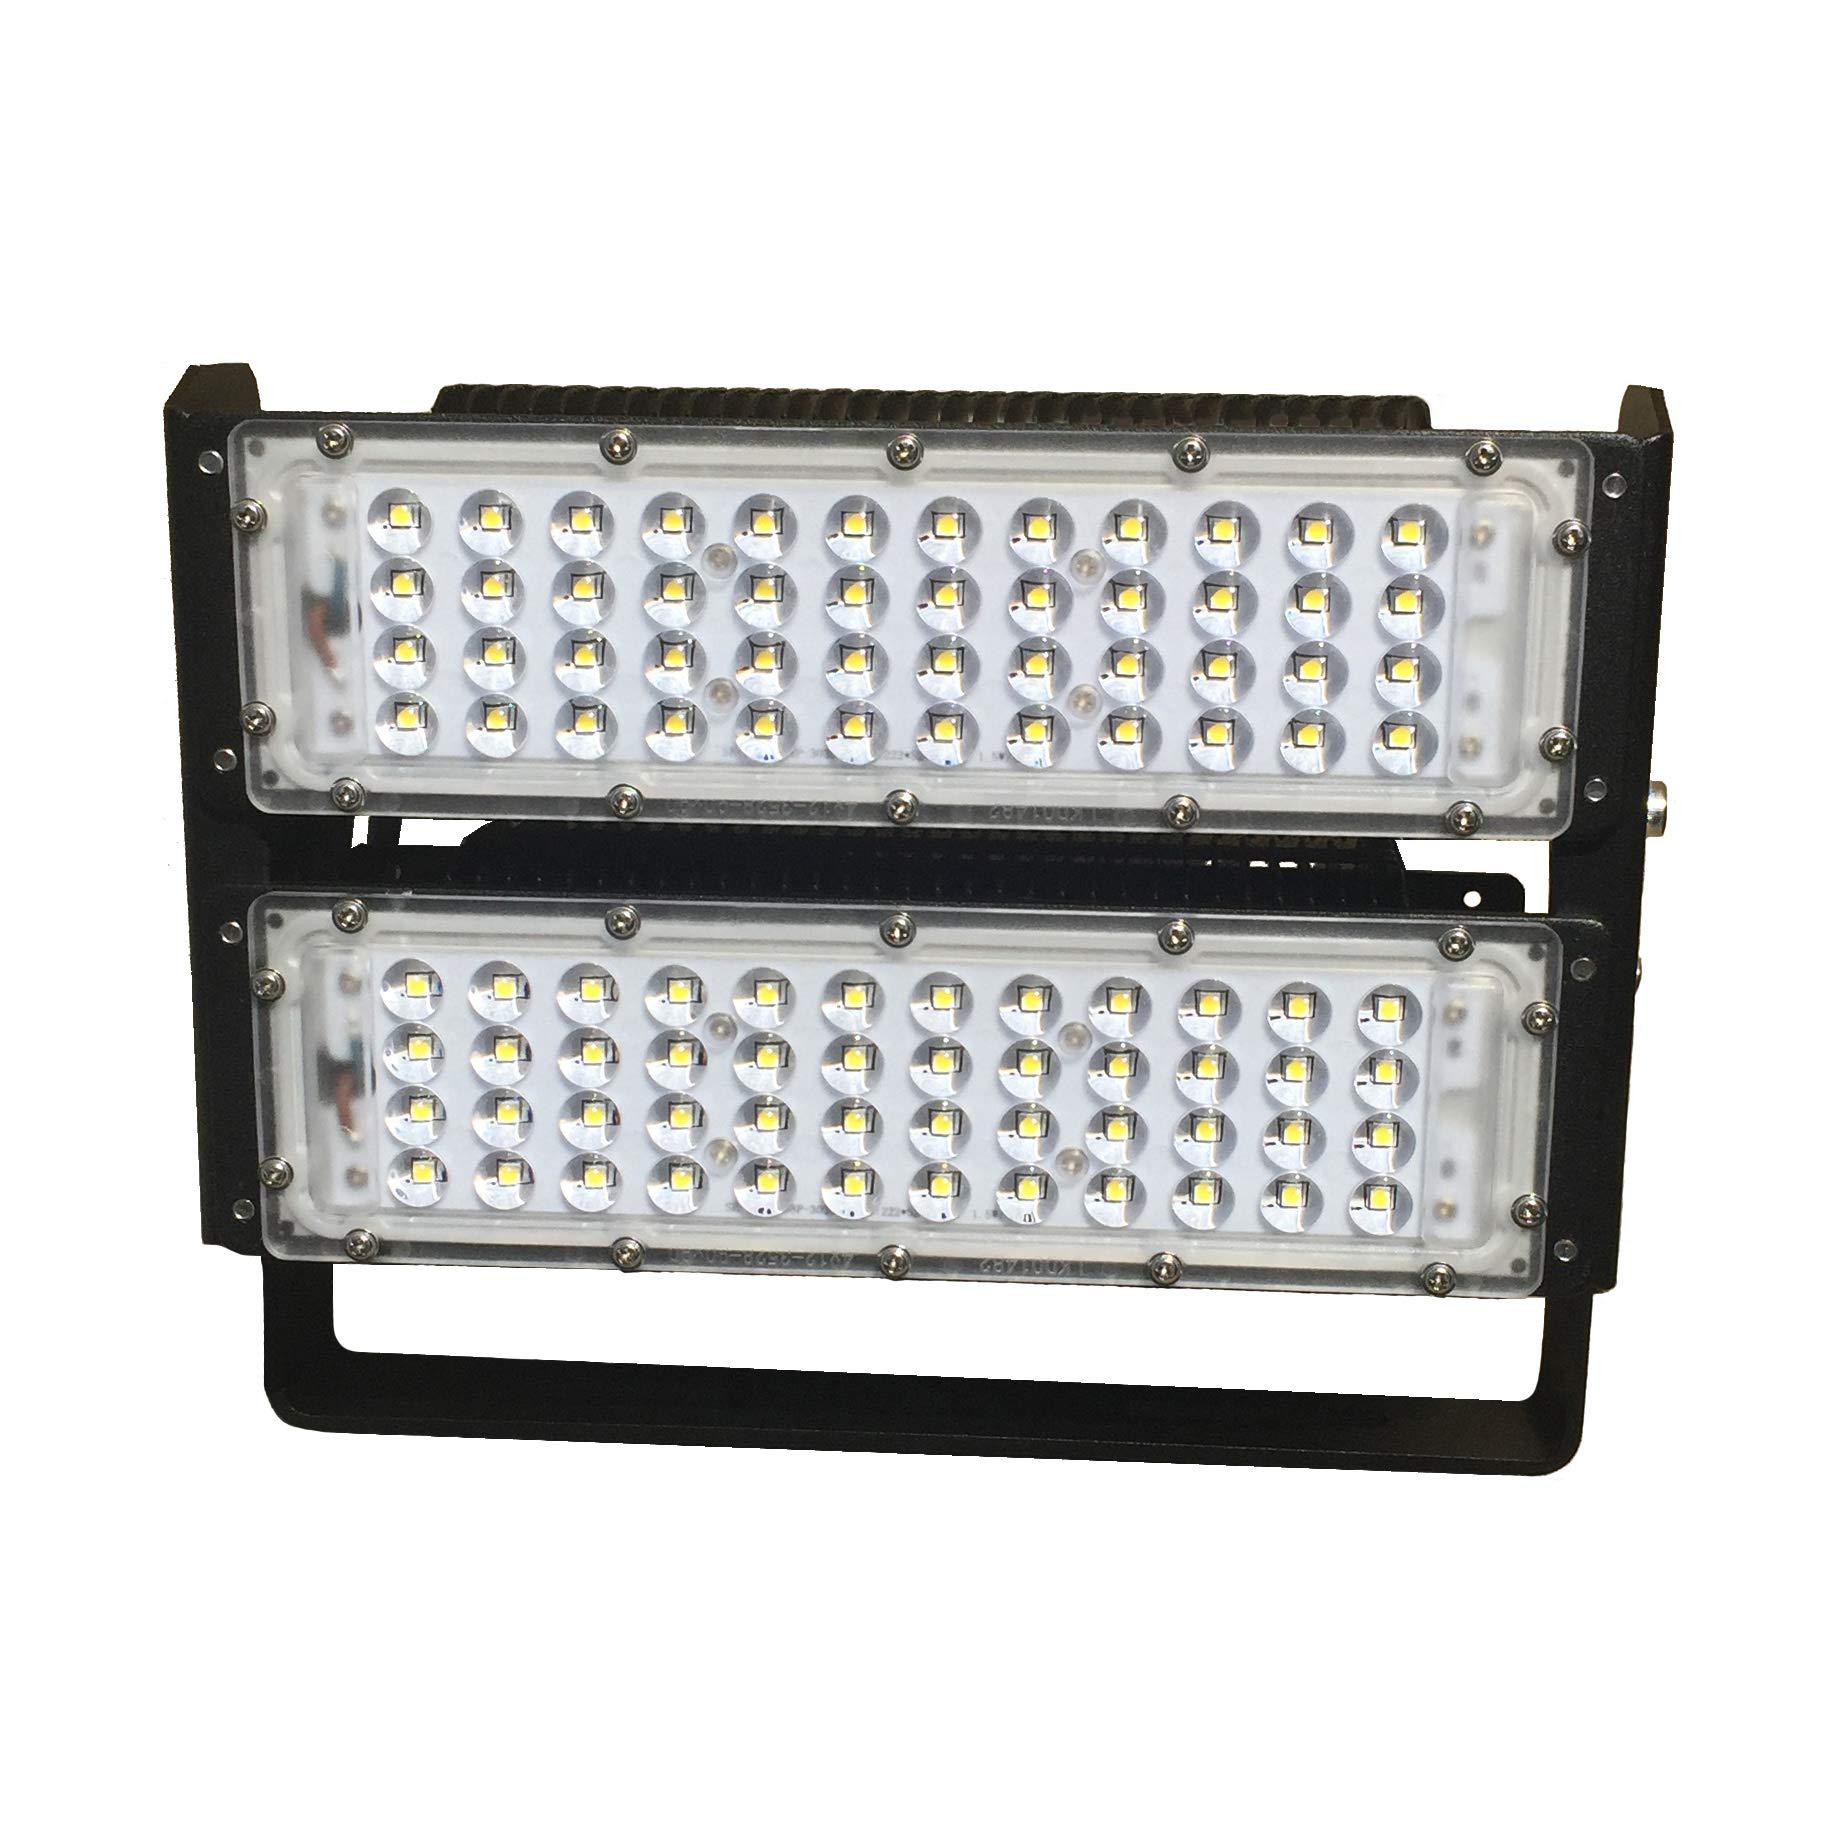 Espled Proyector LED 100W, 100 W, Negro: Amazon.es: Iluminación